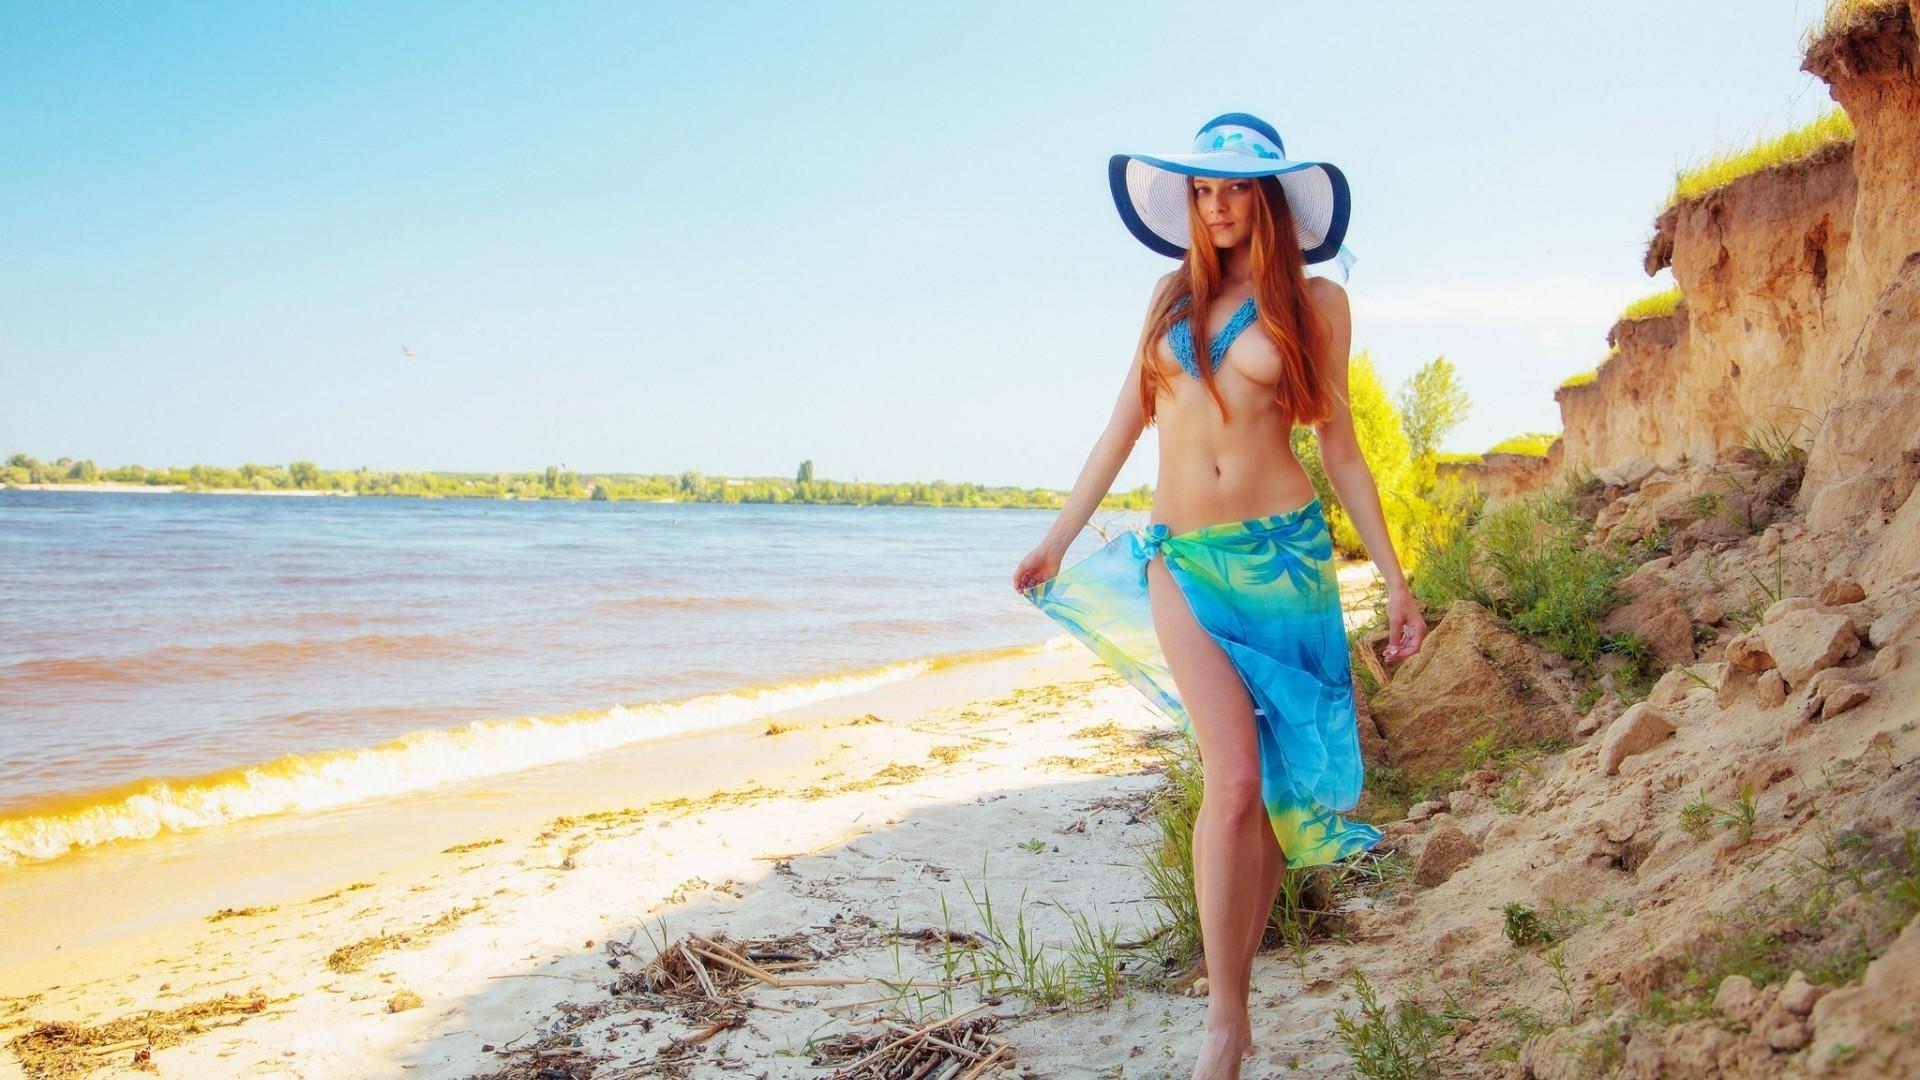 рыжие девушки на пляже фото